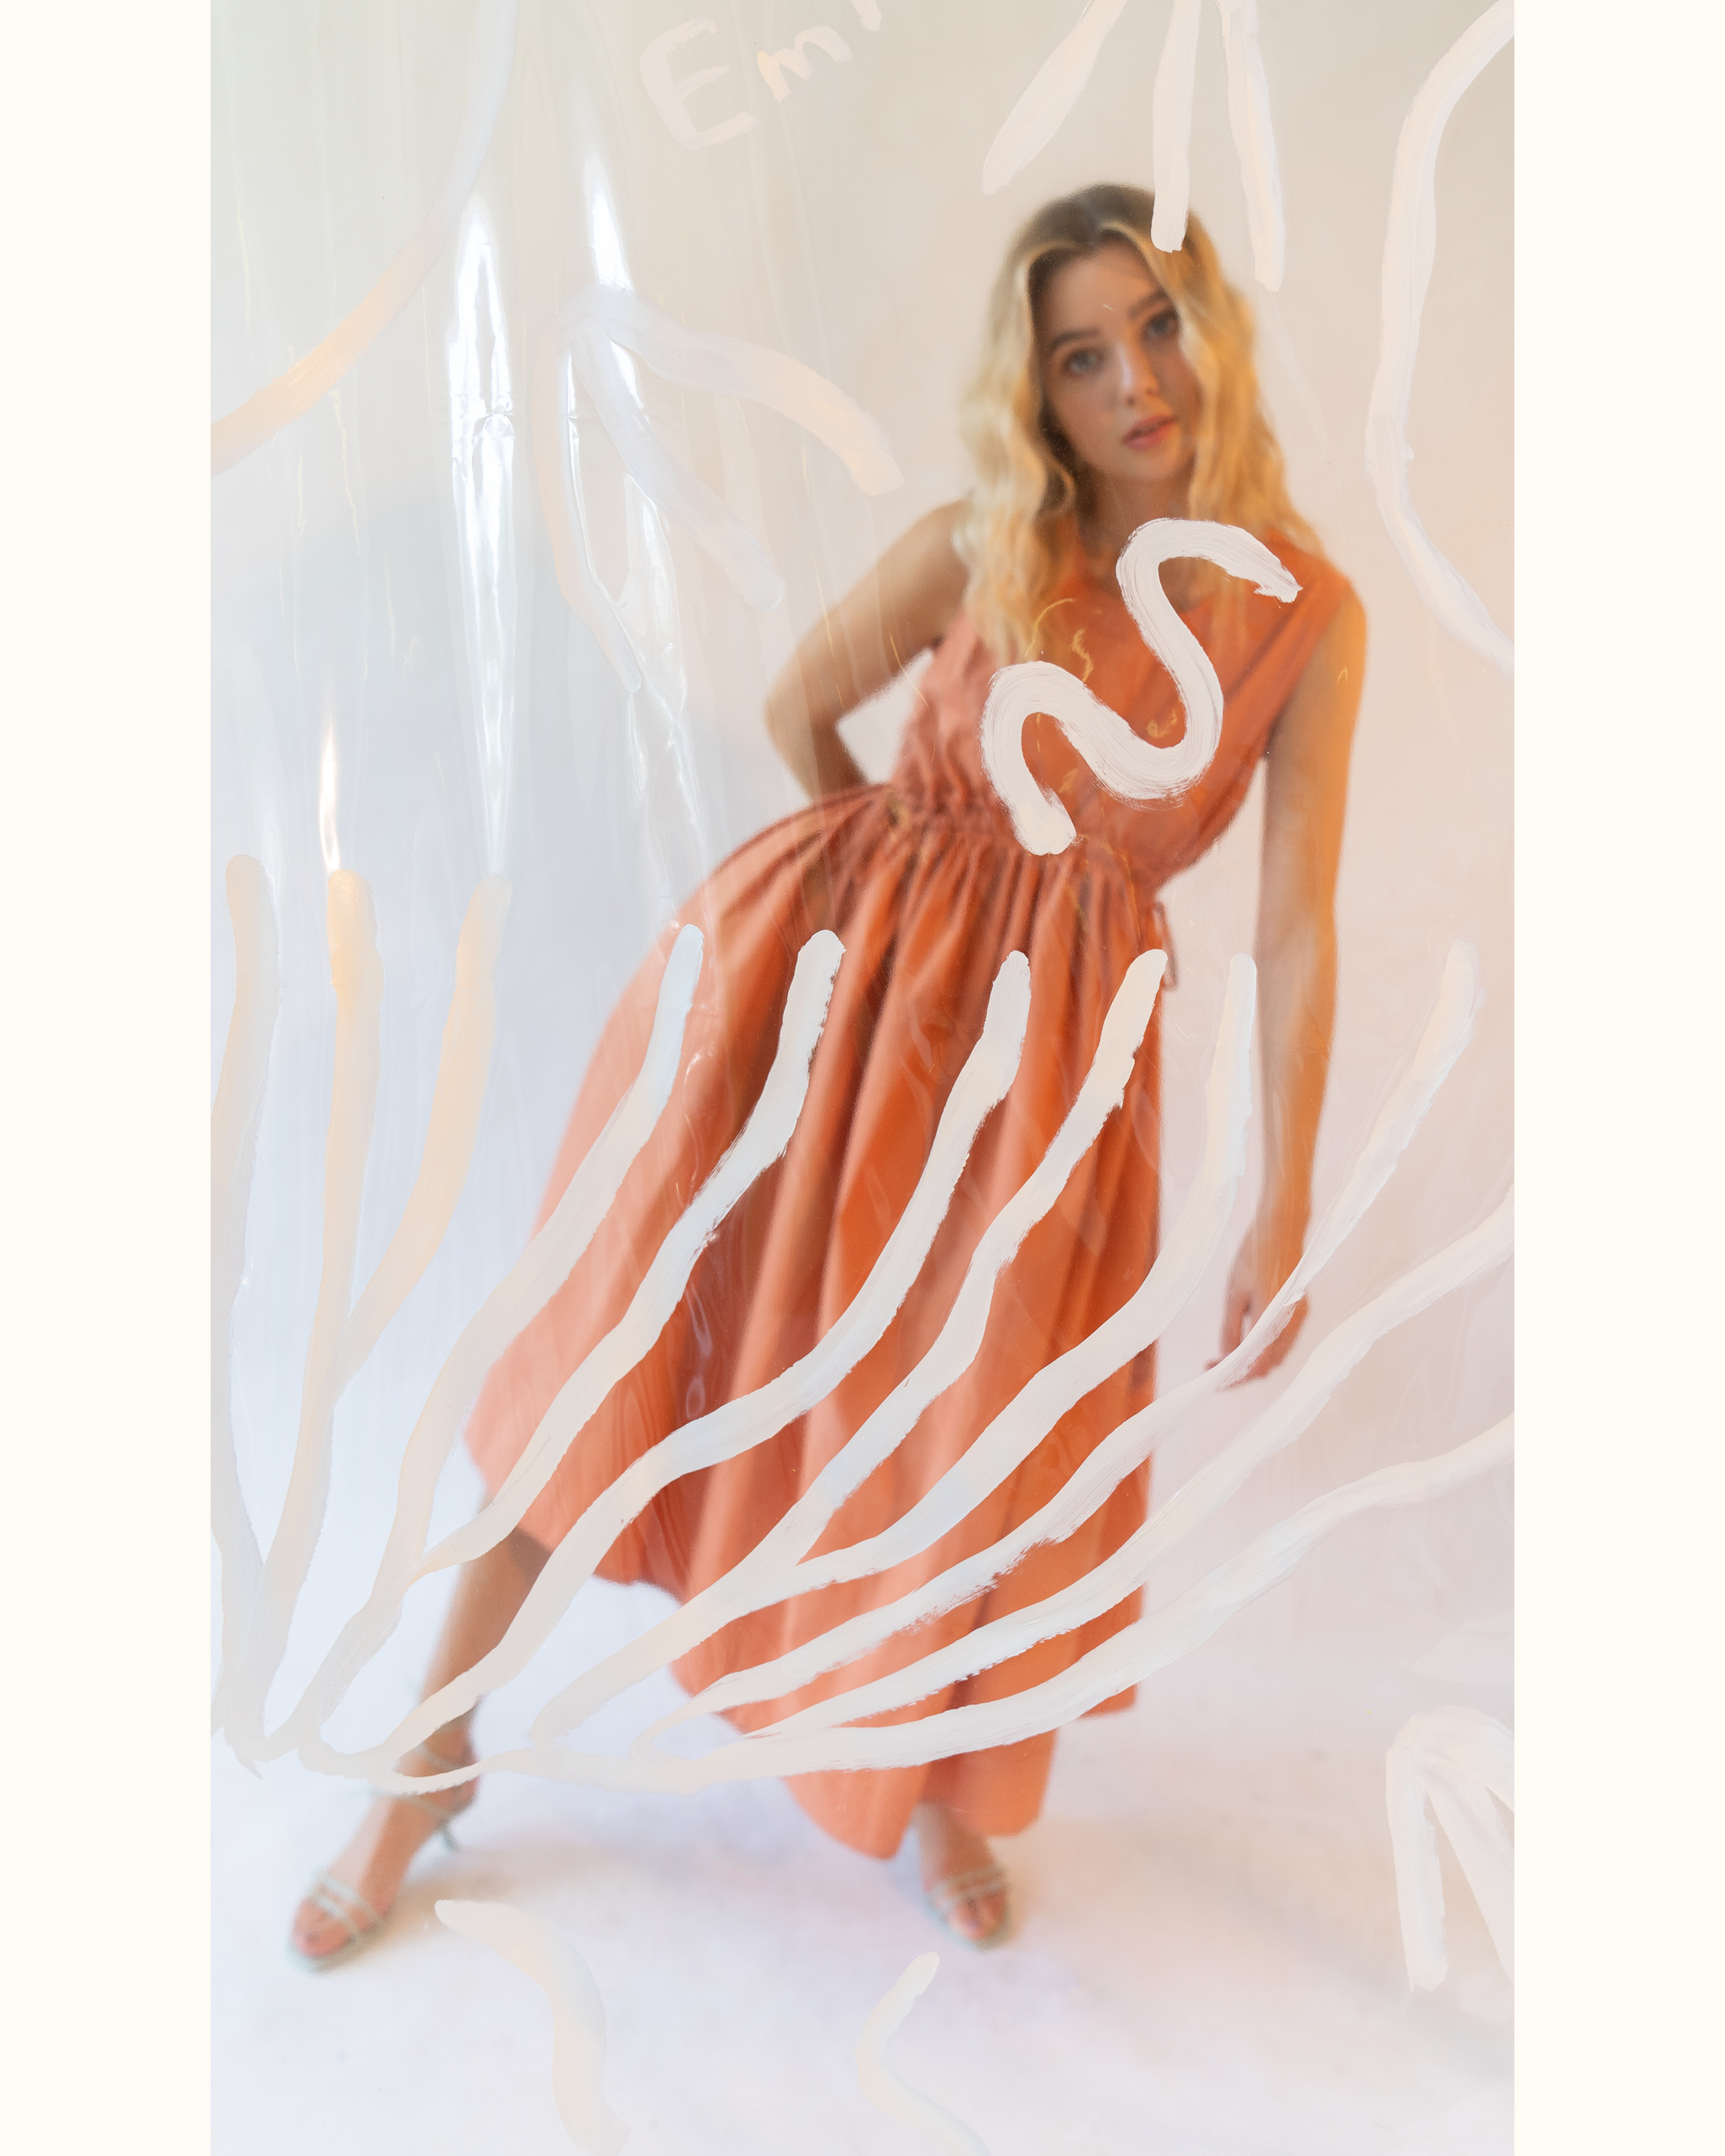 https://eminandpaul.com/app/uploads/2021/05/orange-curved-shirred-waist-side-tie-dress-2.jpg